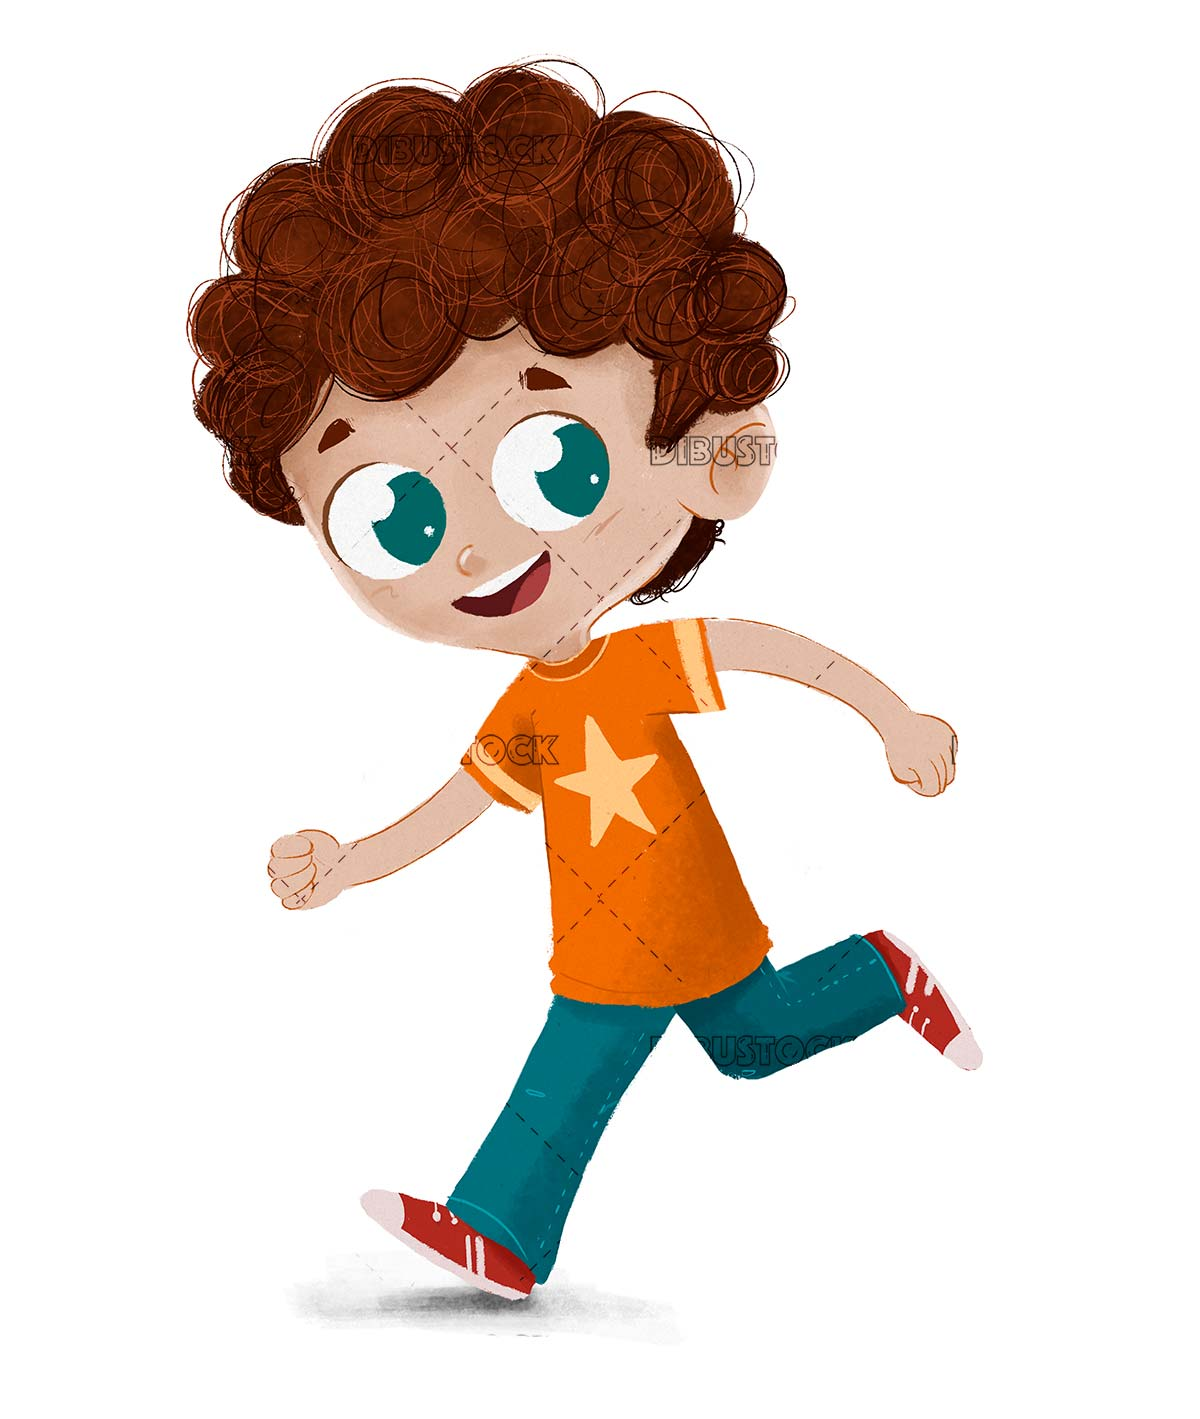 Boy running playing happy